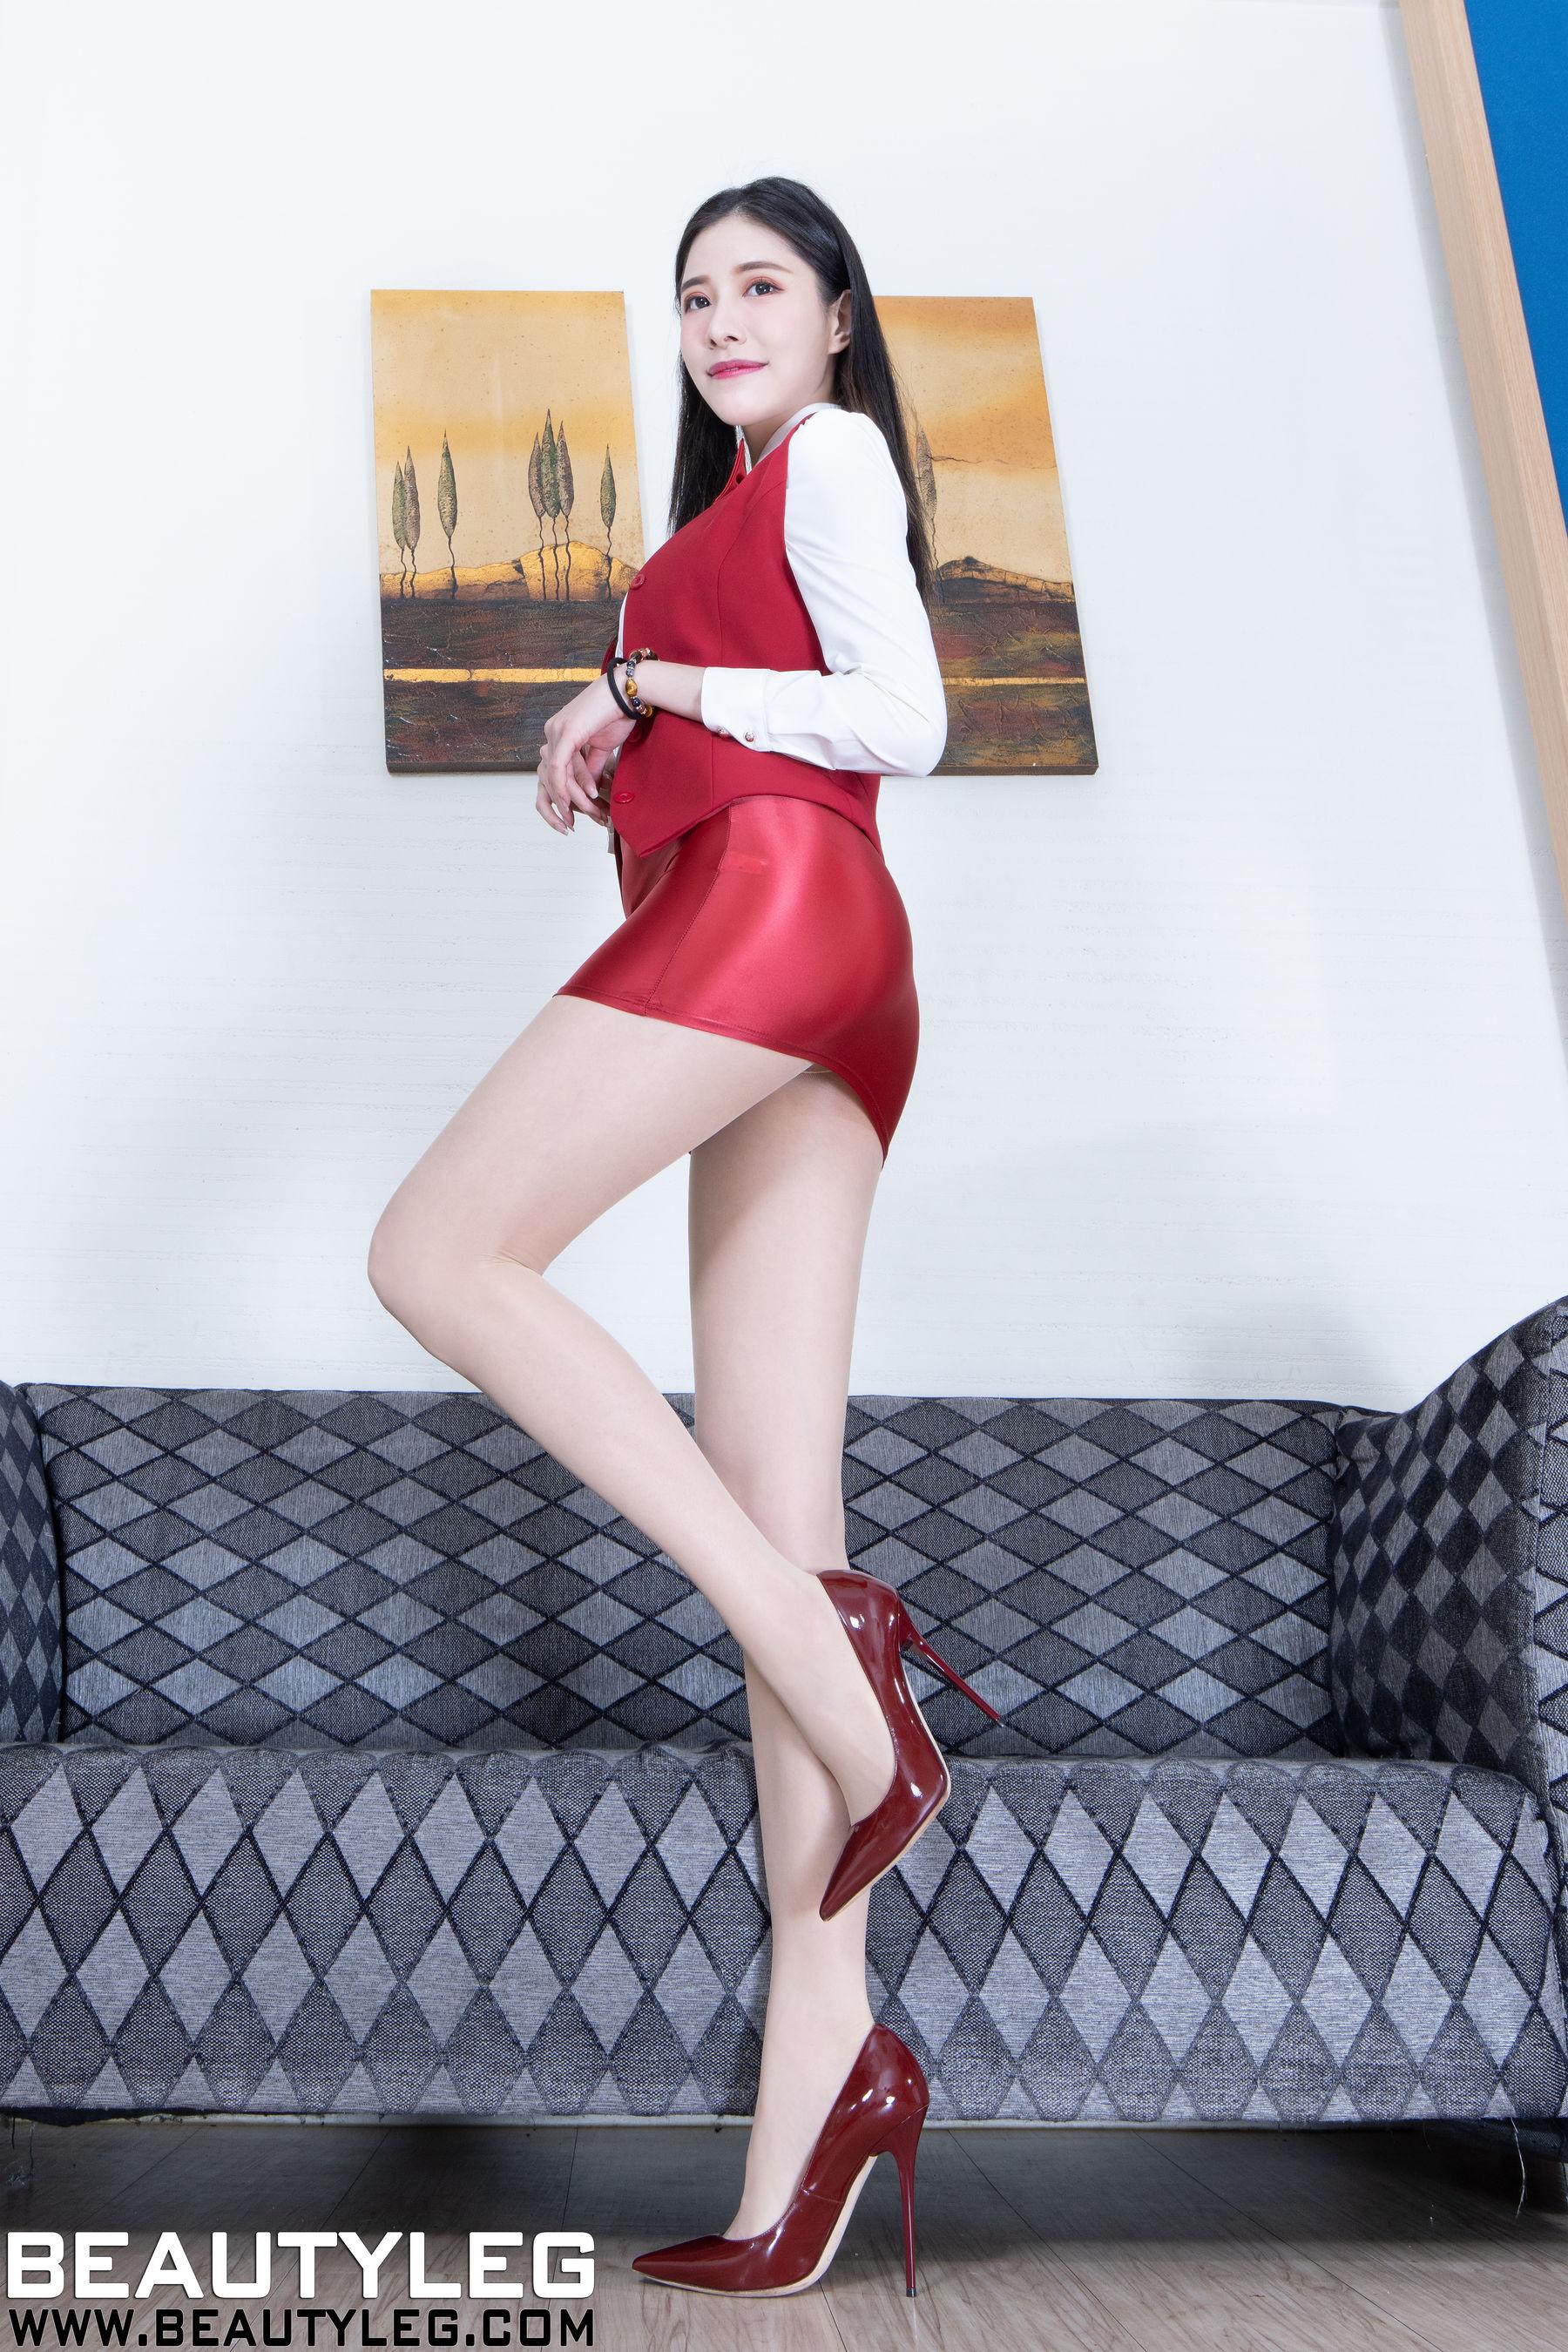 VOL.1854 [Beautyleg]肉丝美腿:陈玉雪(腿模Abby)超高清个人性感漂亮大图(41P)